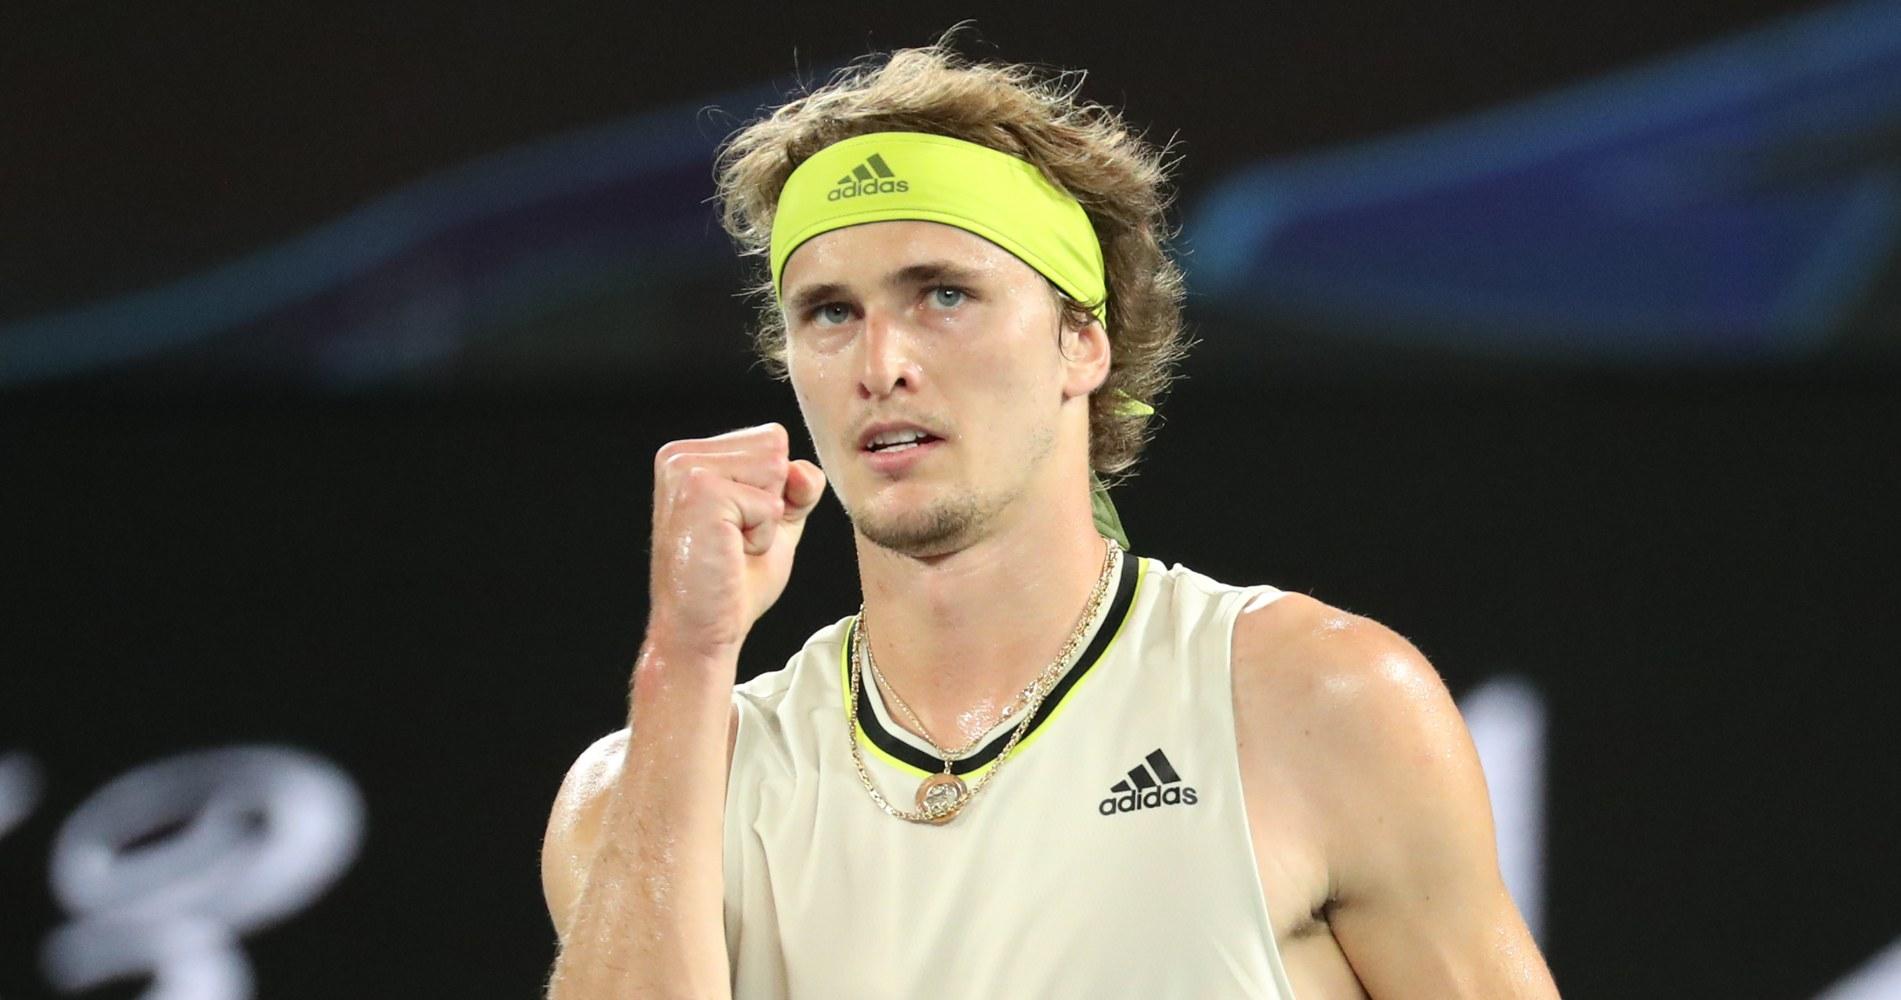 Alexander Zverev, Australian Open, 2021